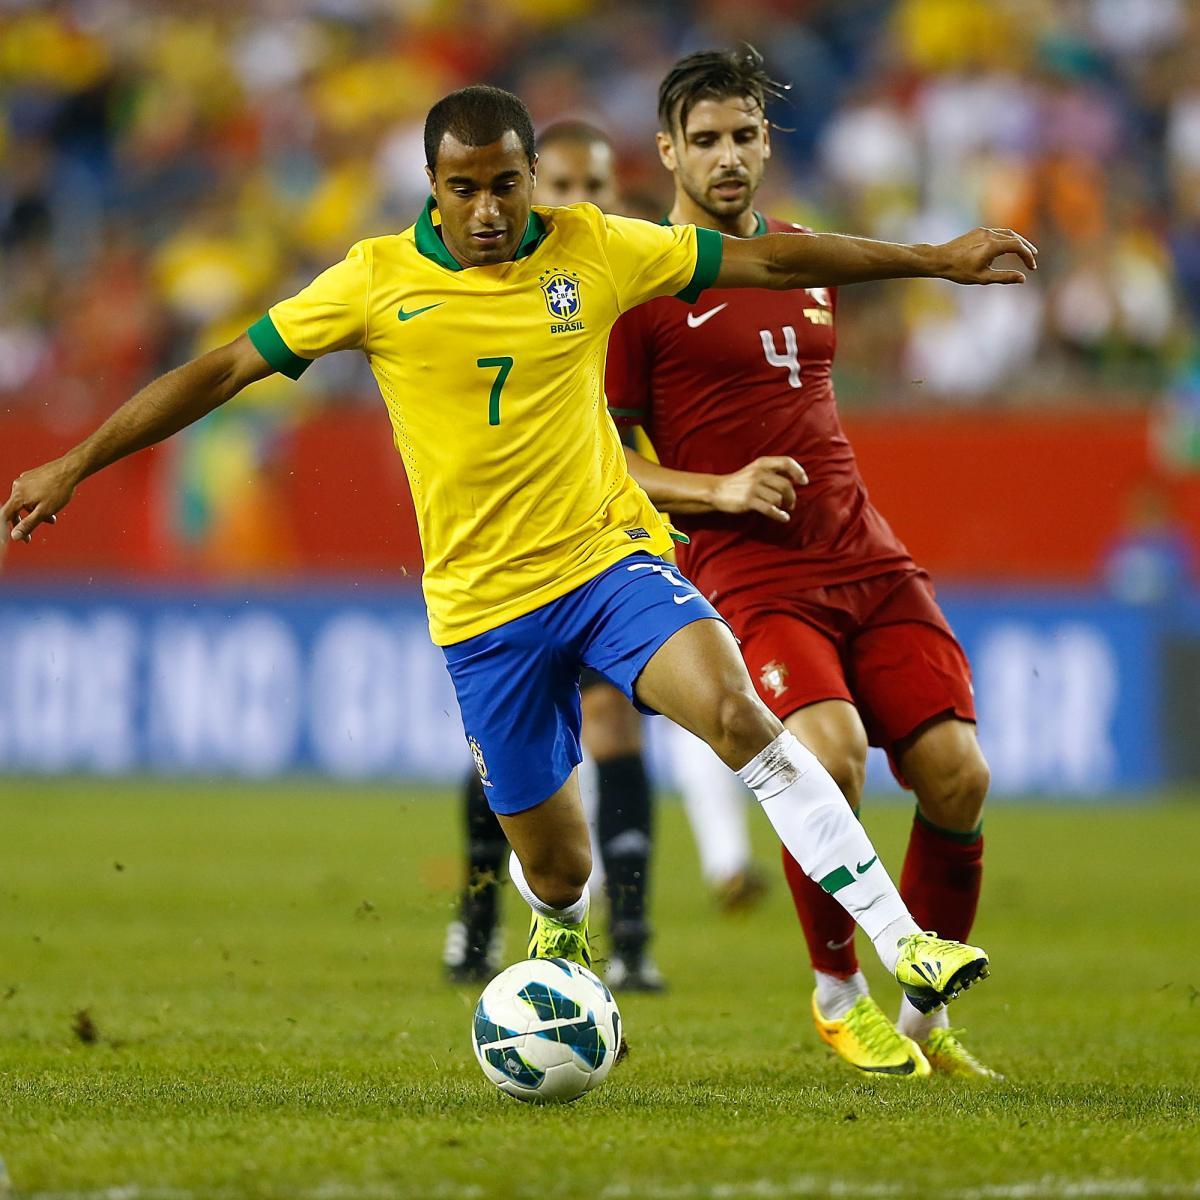 Football Stars Lucas Moura New Bio And Photos: South Korea Vs. Brazil: Highlighting The Top Stars To